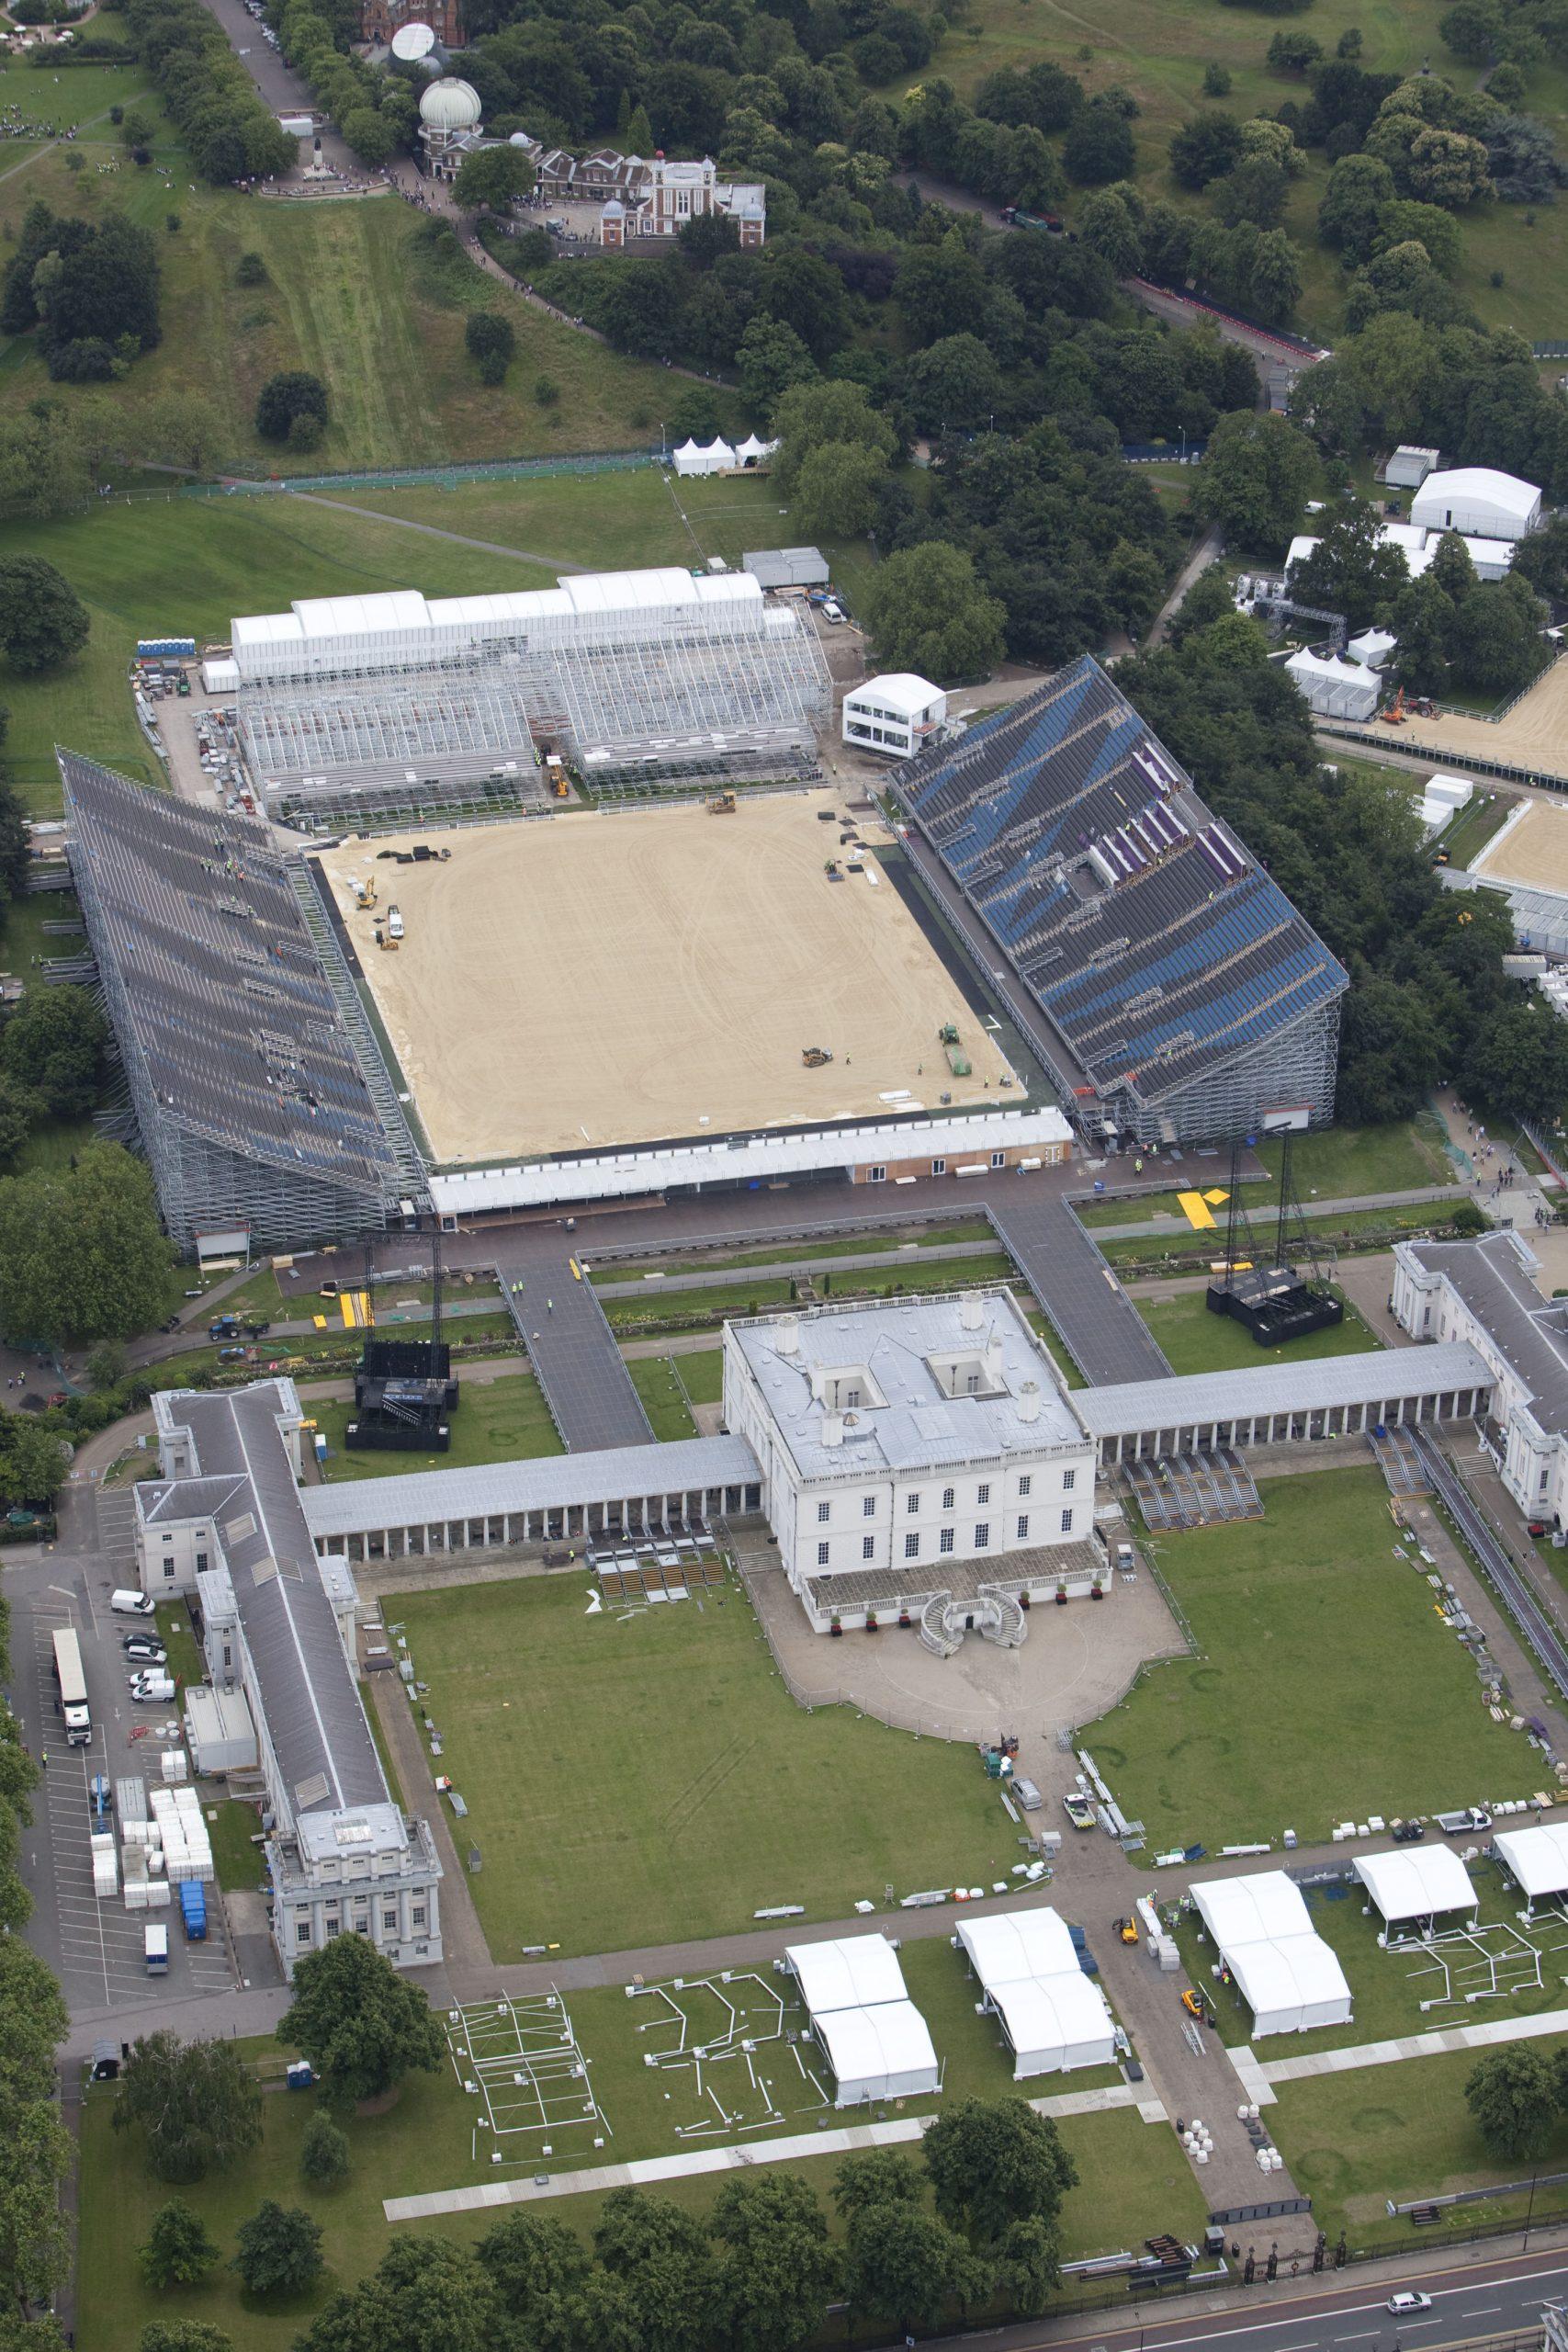 London 2012 Olympic Games   Aerial View   TSG